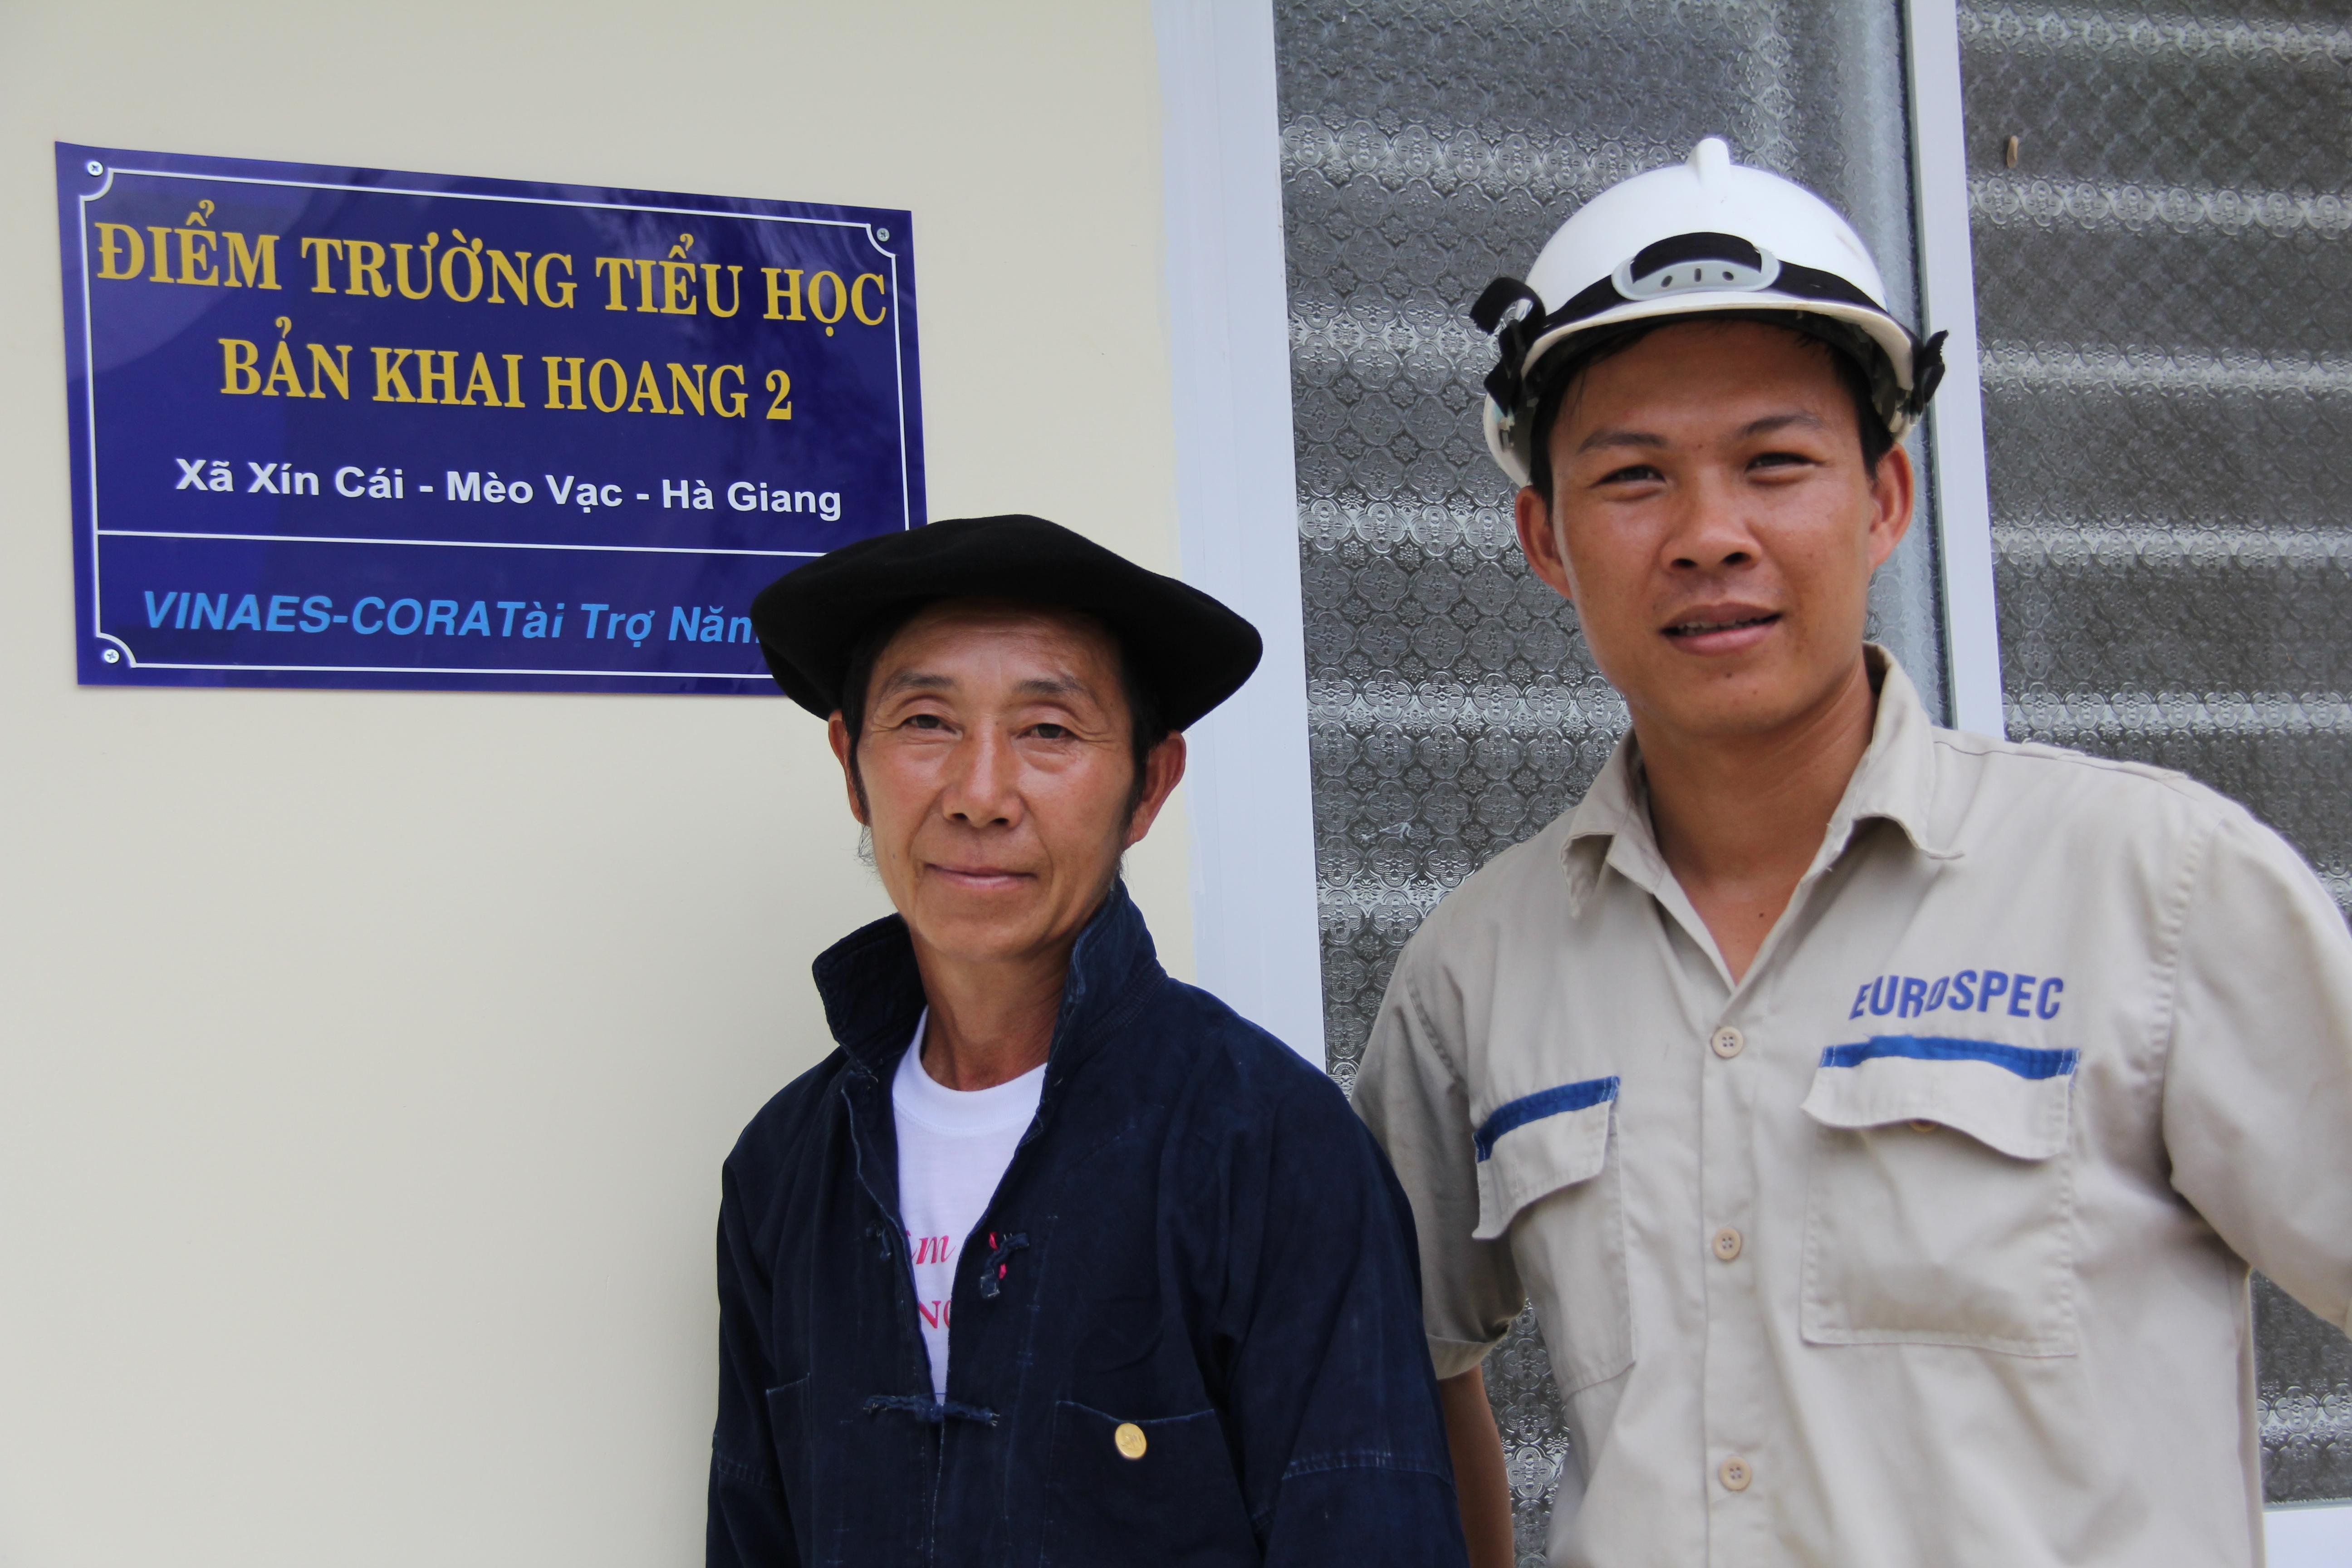 Ly Sin Sinh, a dedicated village chief